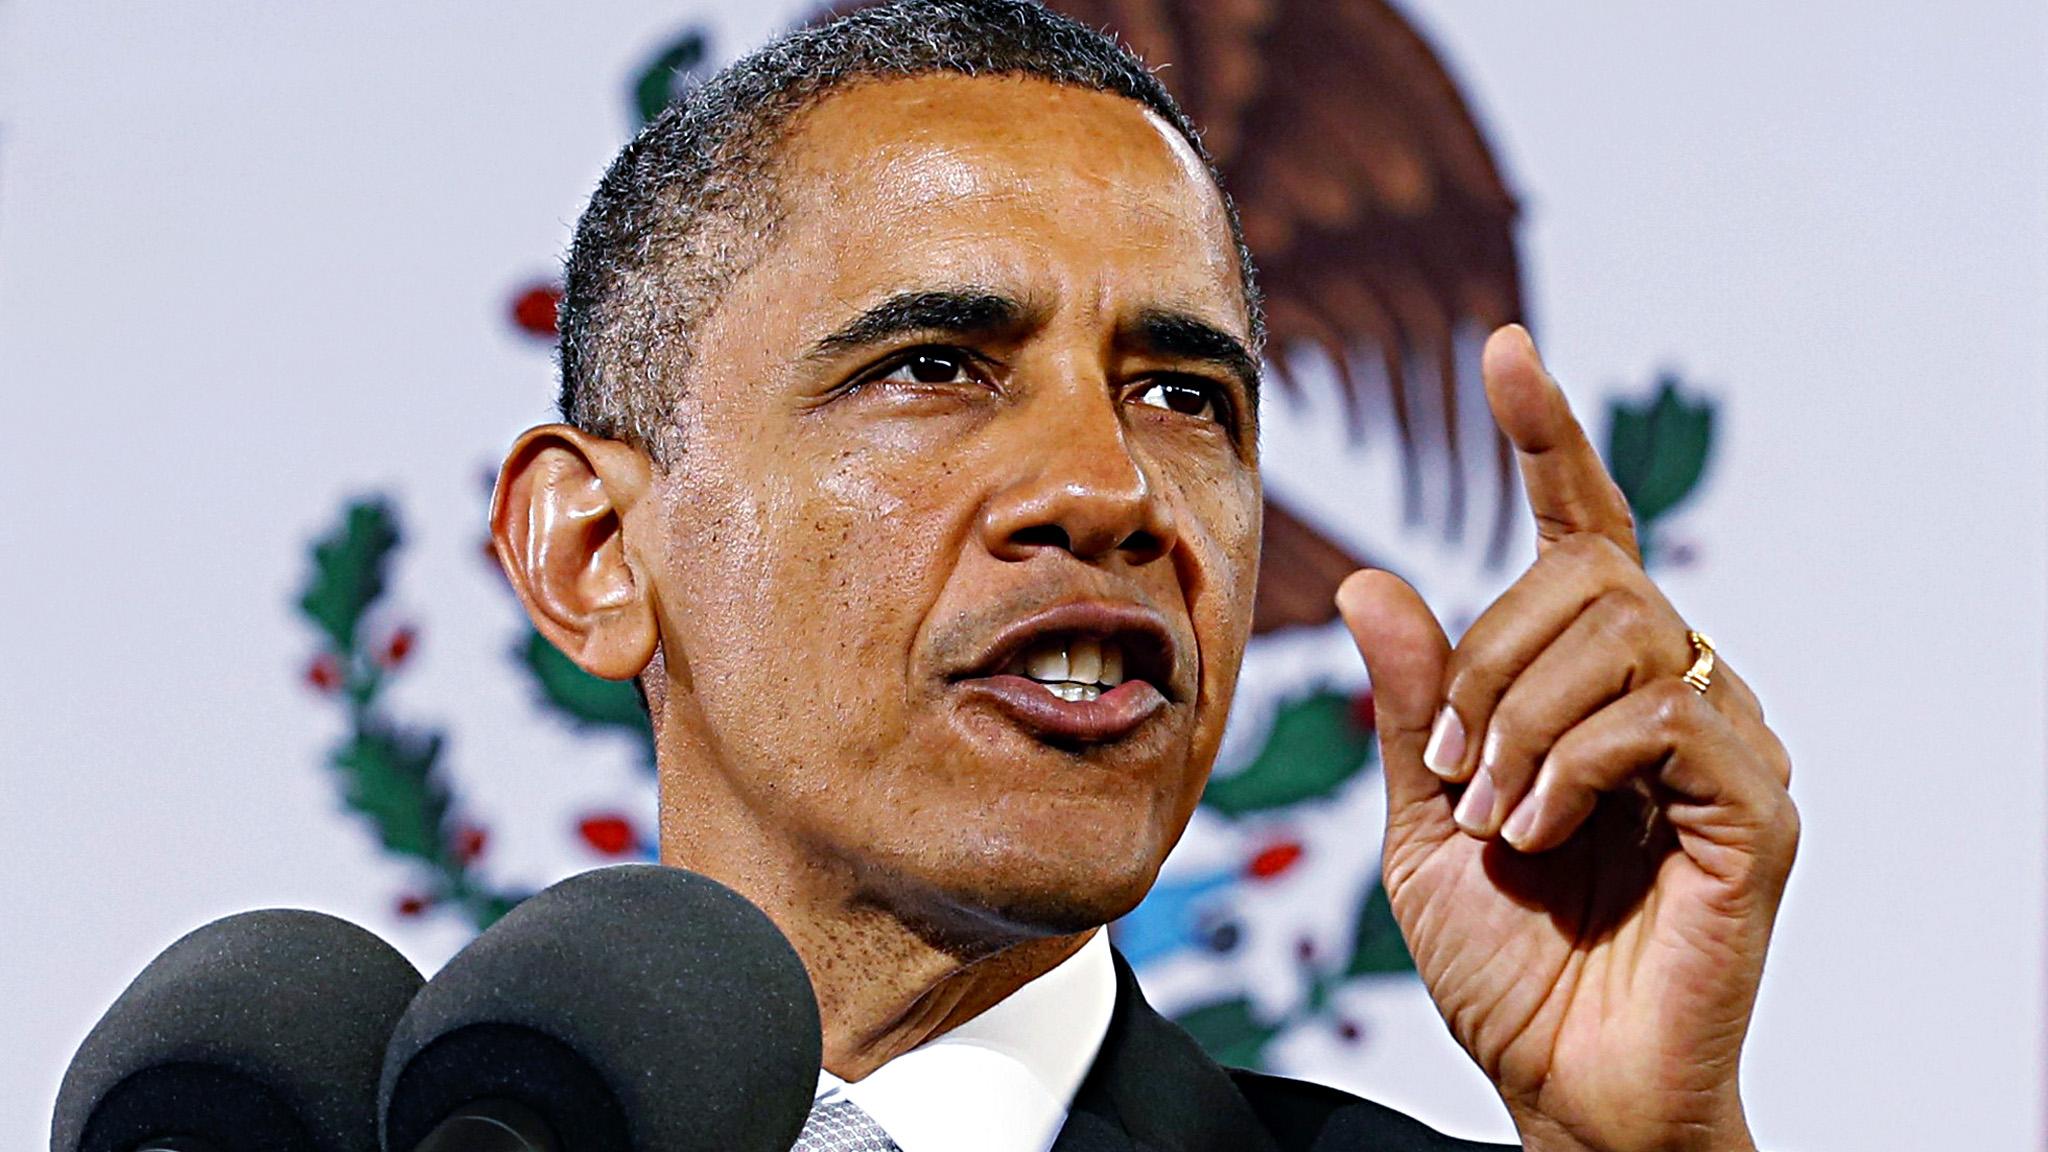 Barack Obama HD Wallpapers 2048x1152